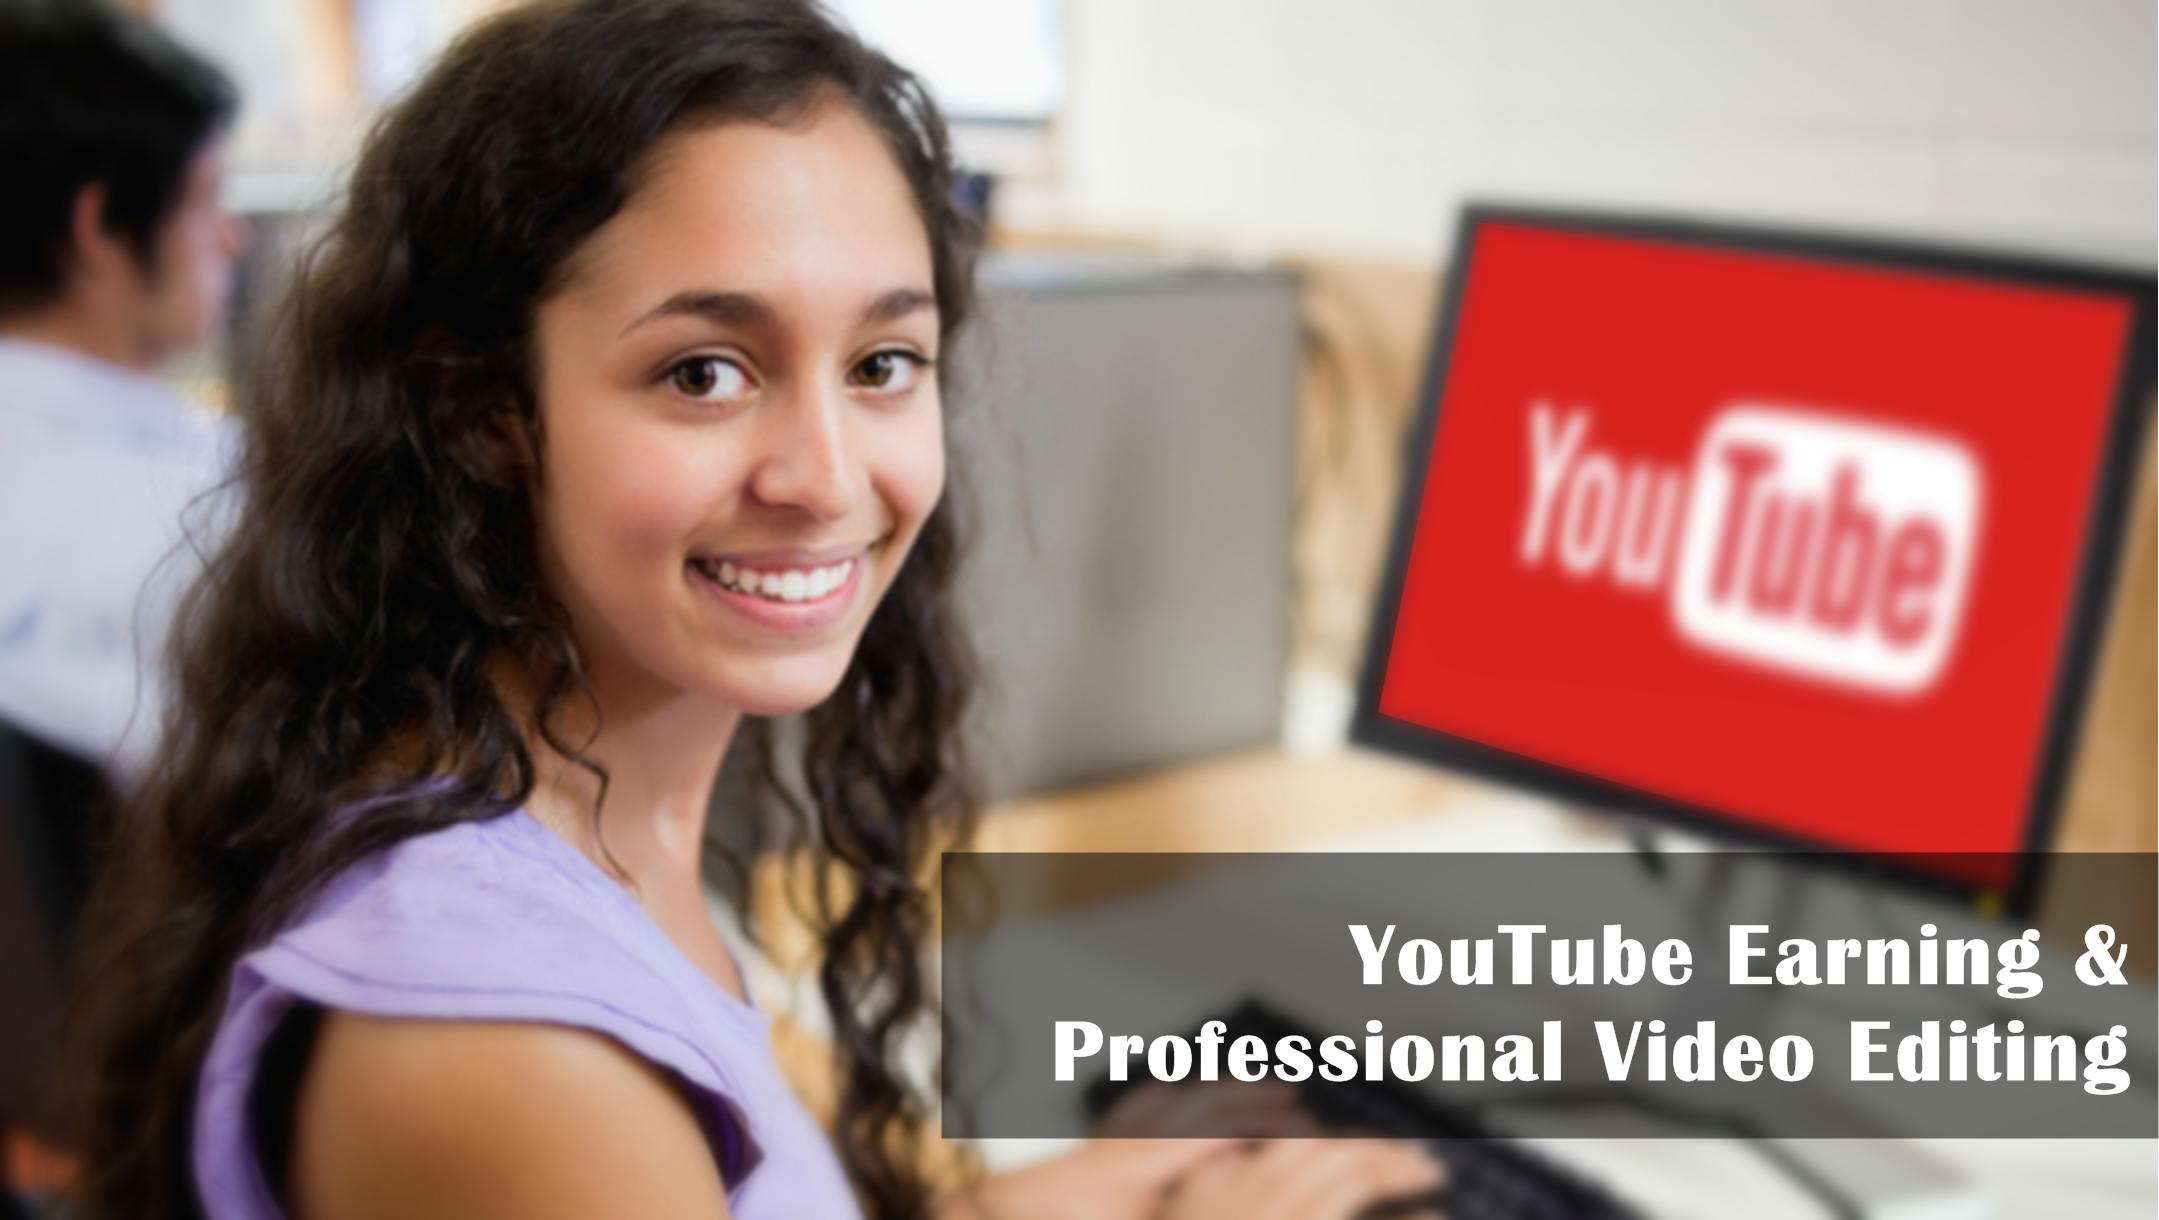 YouTube Earning , YouTube থেকে আয় - ইউটিউব আর্নিং এন্ড ভিডি ইডিটিং কোর্স